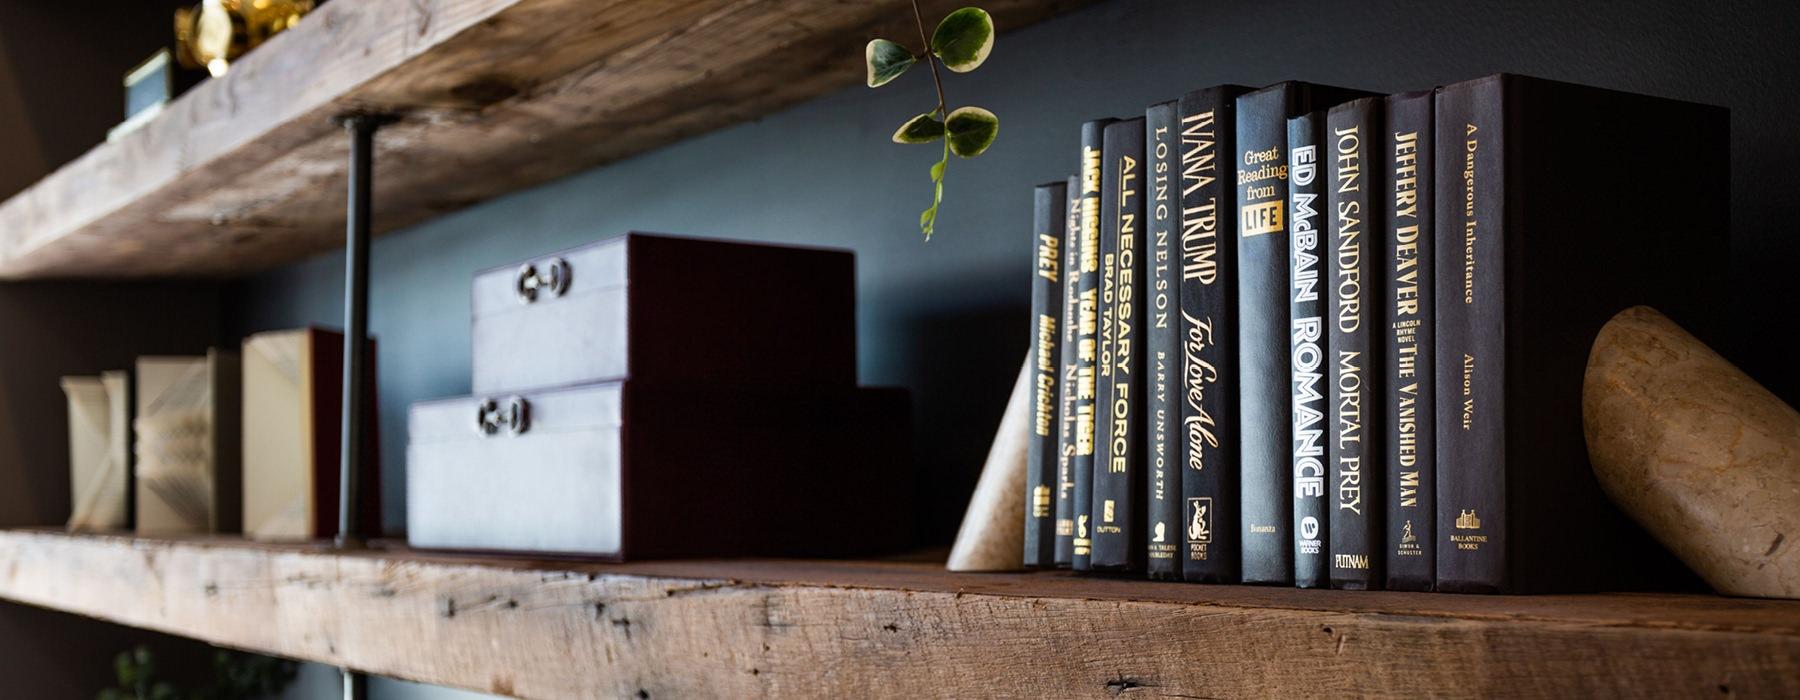 staged wood bookshelves against dark, bluish grey wall